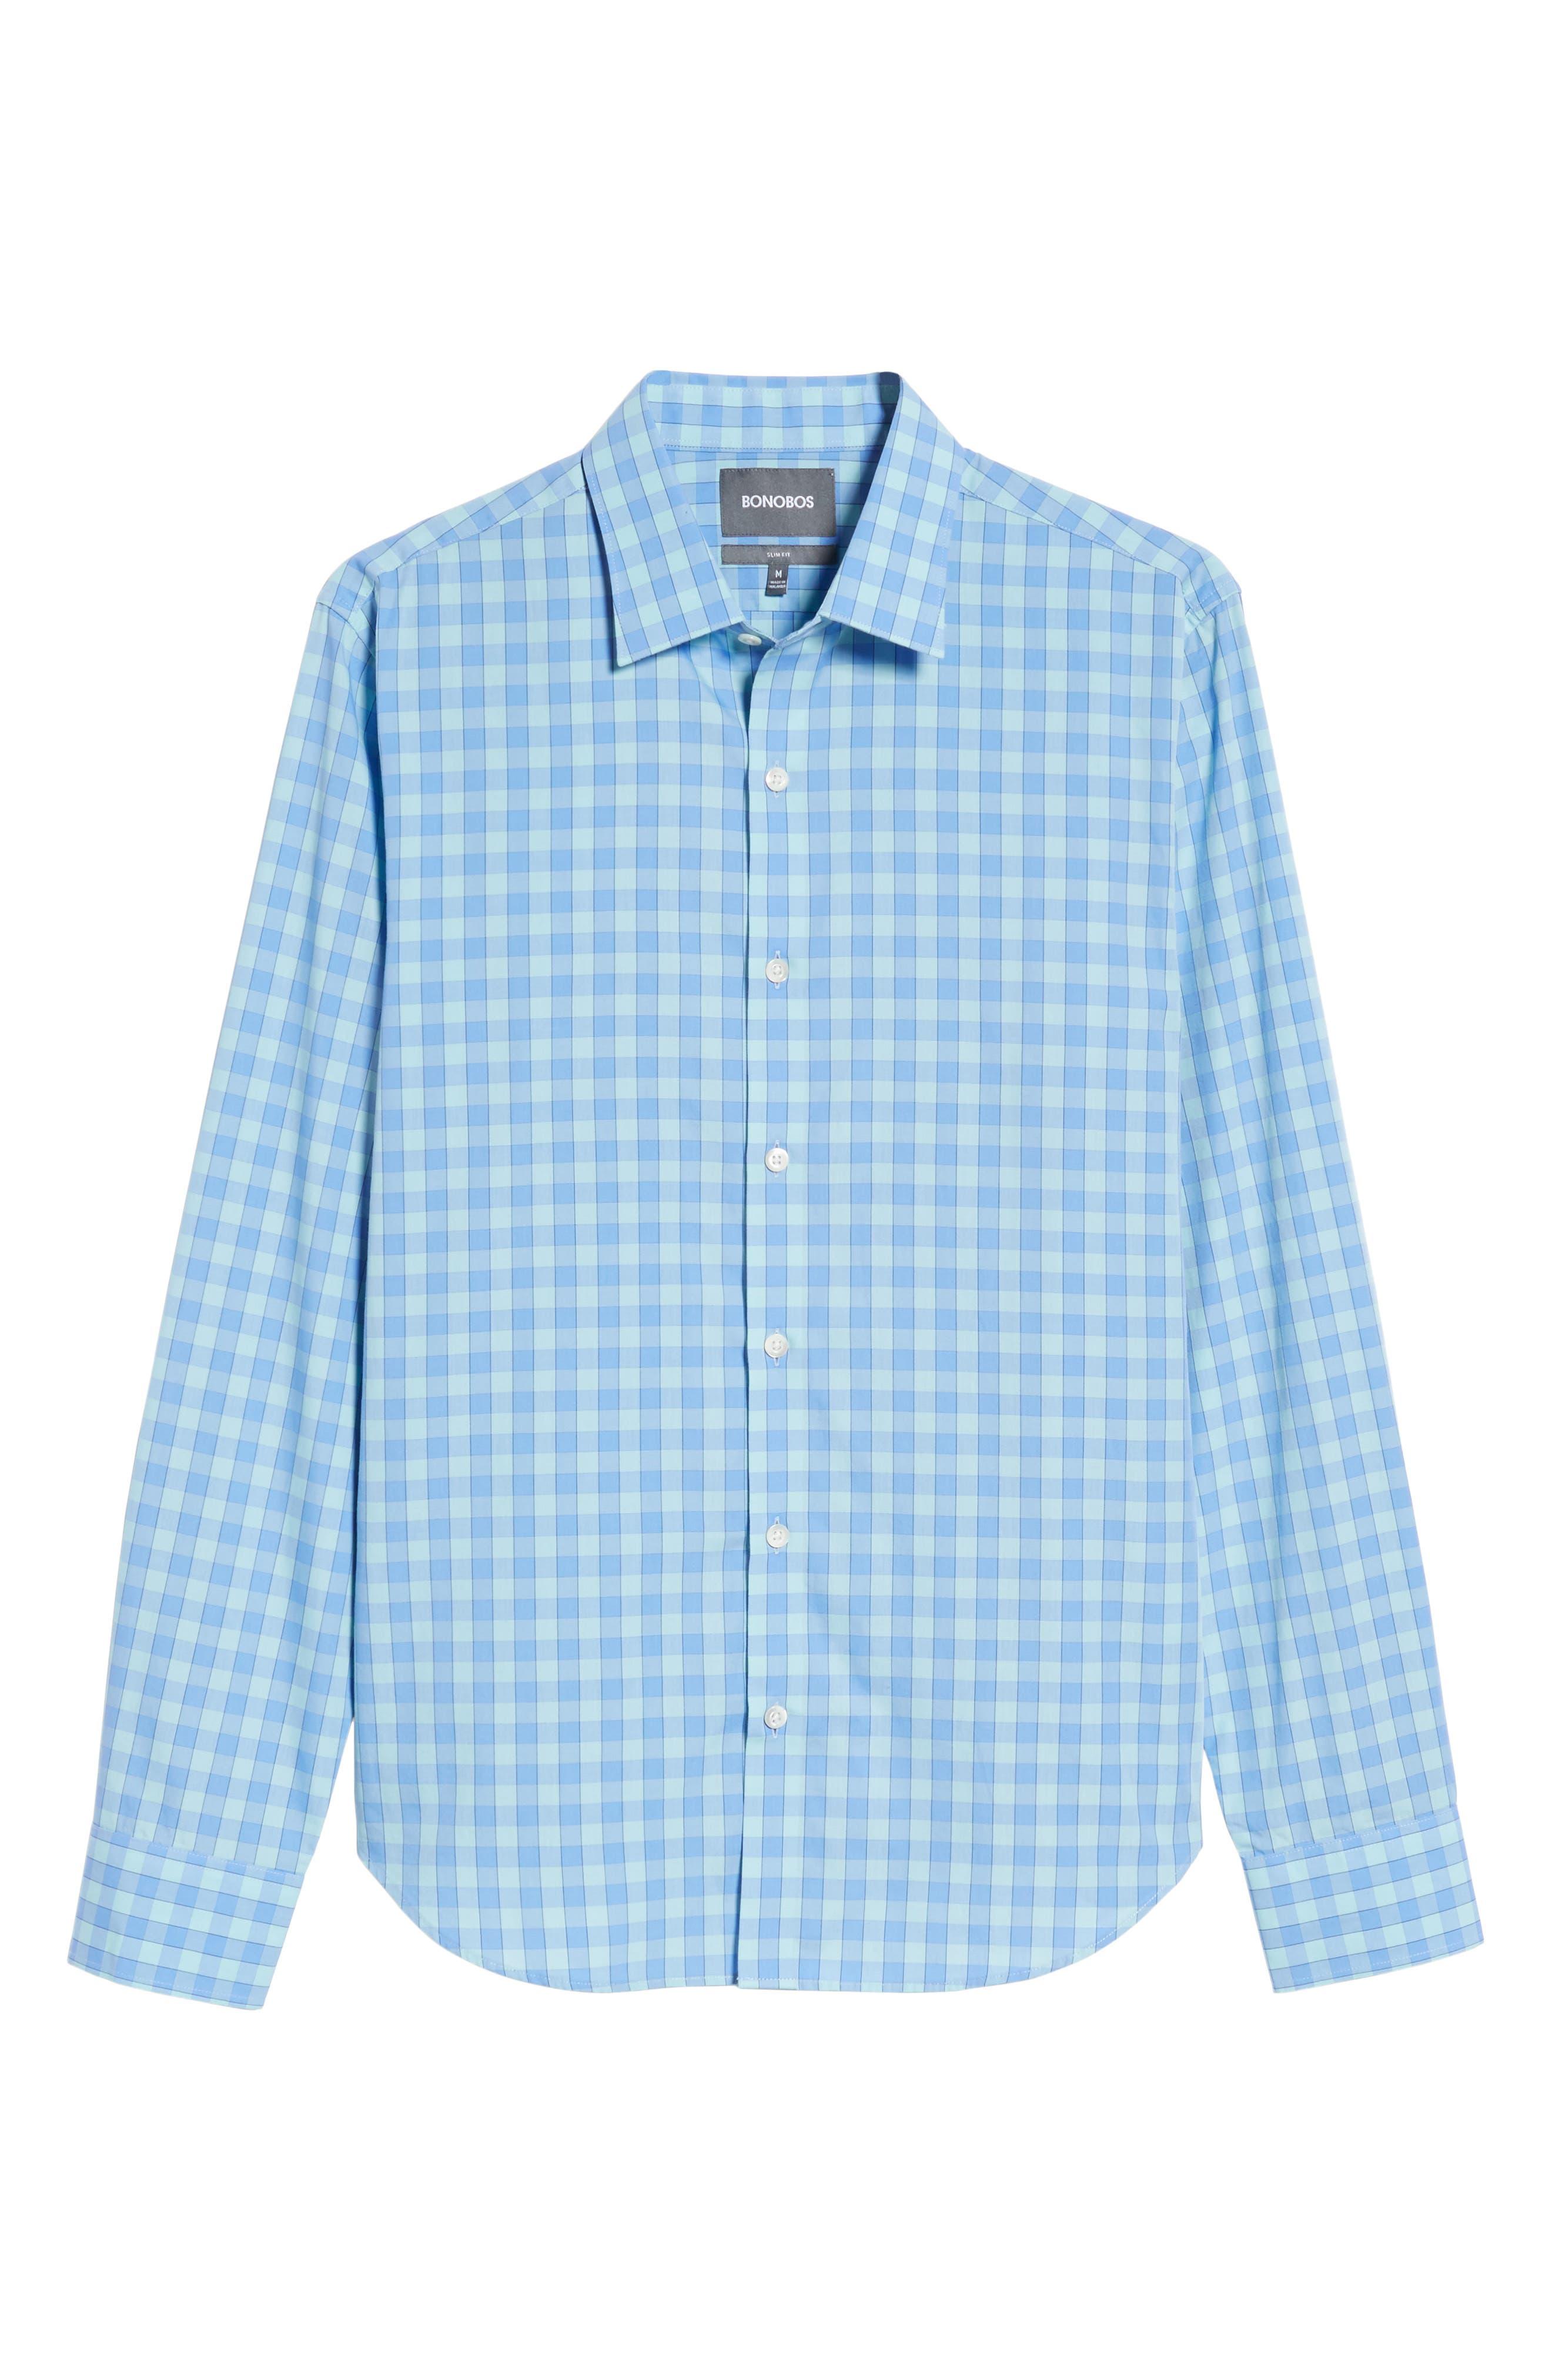 Unbutton Down 2.0 Slim Fit Gingham Sport Shirt,                             Alternate thumbnail 6, color,                             Sail Boat Gingham/ Island